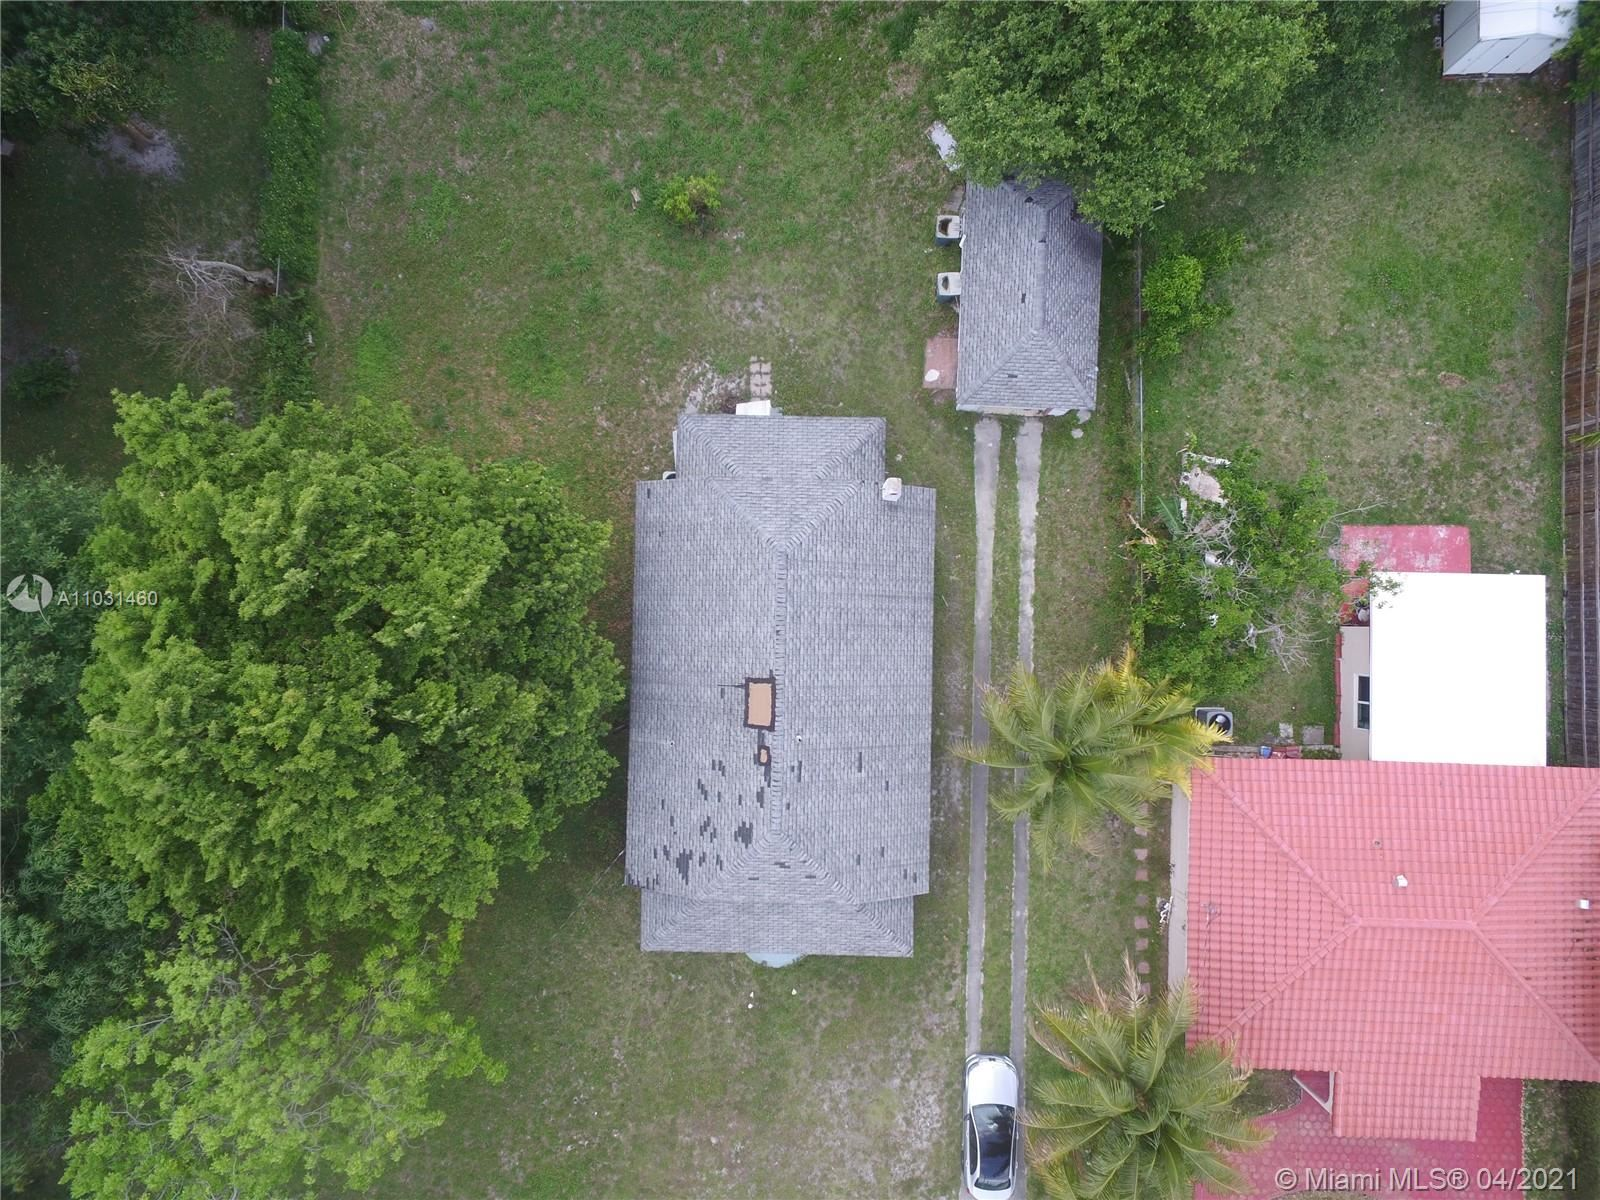 120 SW 1st Ave, Hallandale Beach, FL 33009 - #: A11031460